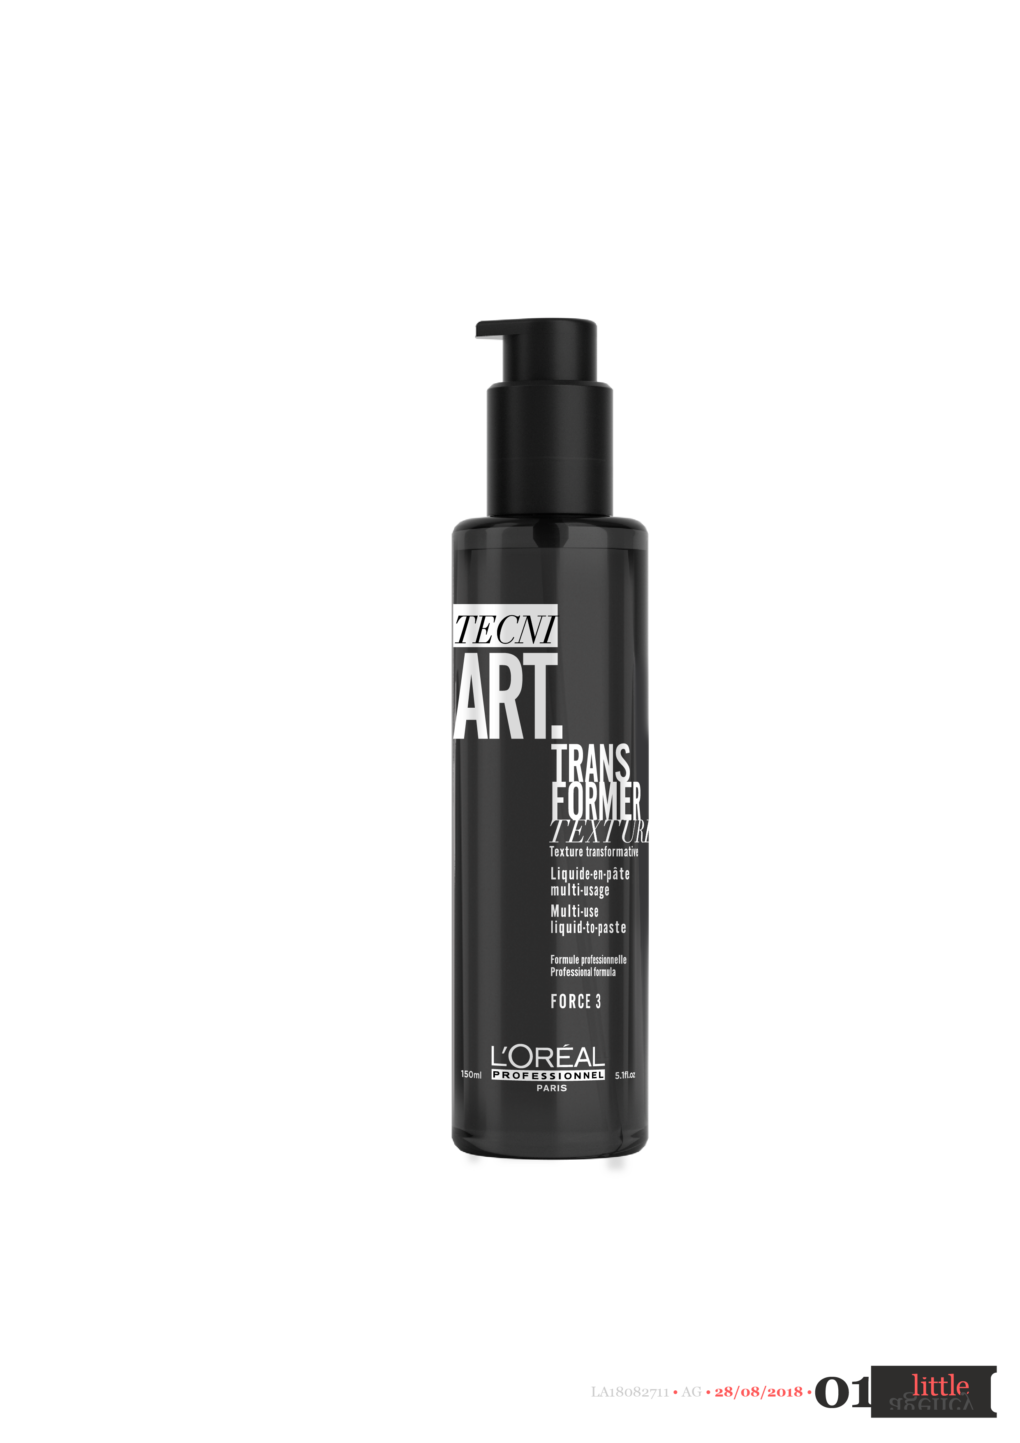 L'Oréal Professionnel rilancia la linea styling TECNIART